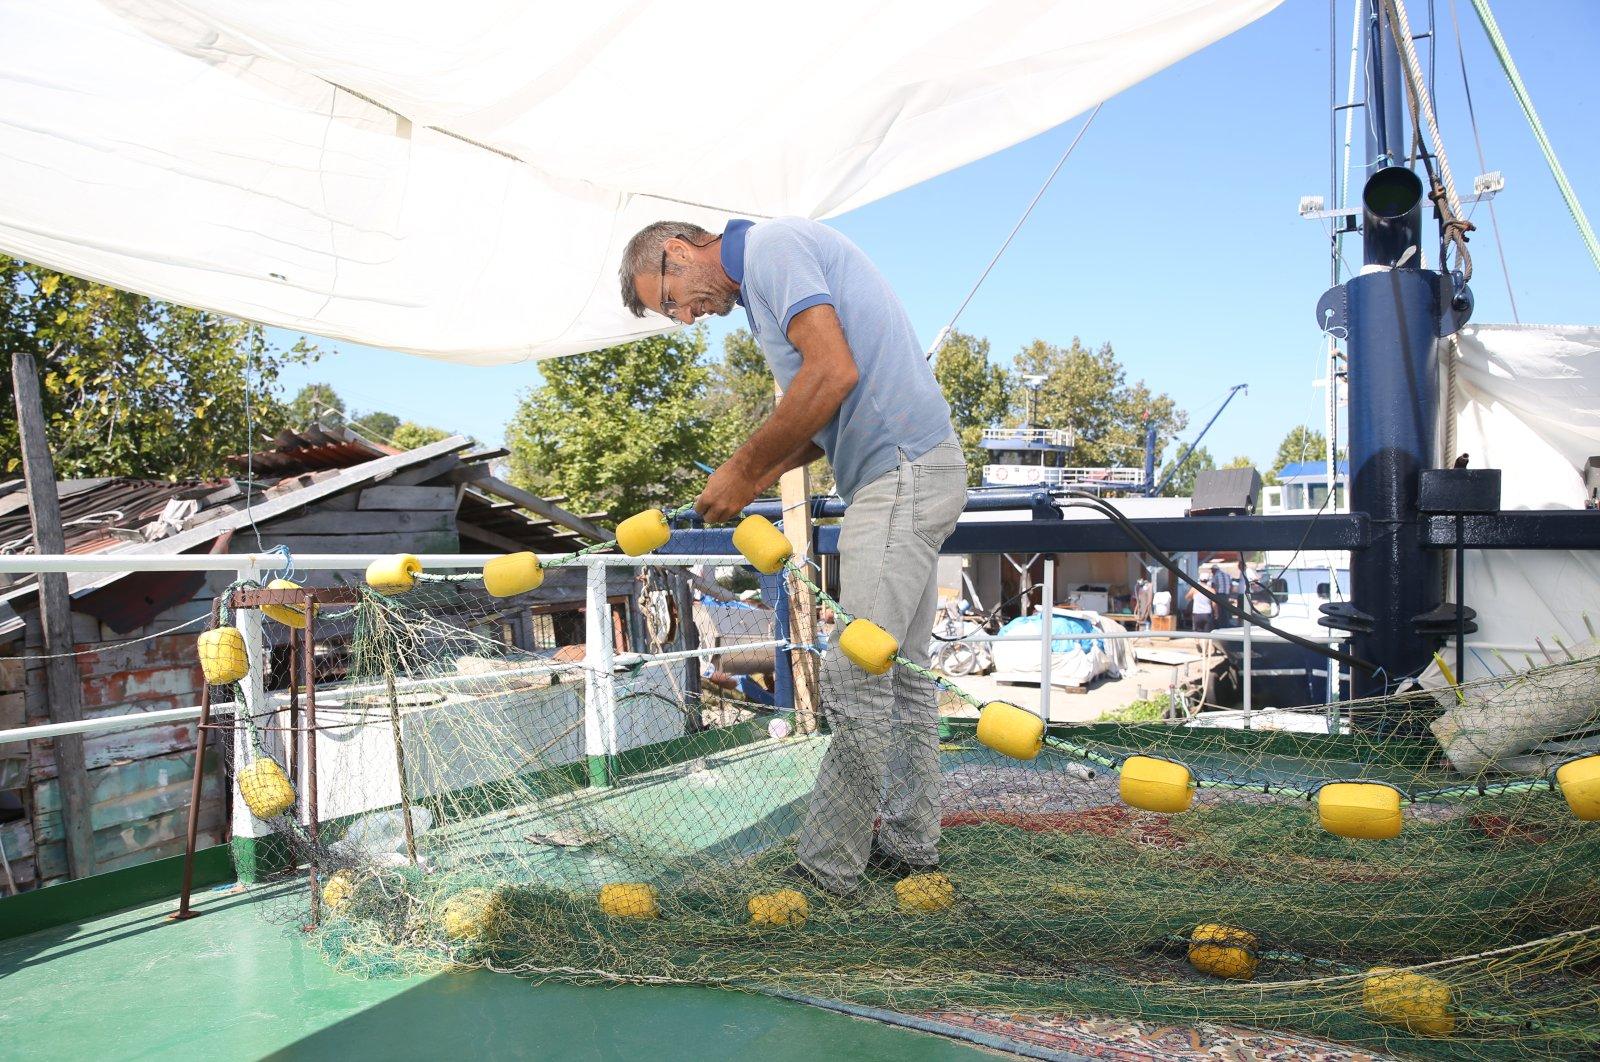 A fisherman repairs a net in Karasu district, in Sakarya, northwestern Turkey, Aug. 28, 2020. (AA Photo)